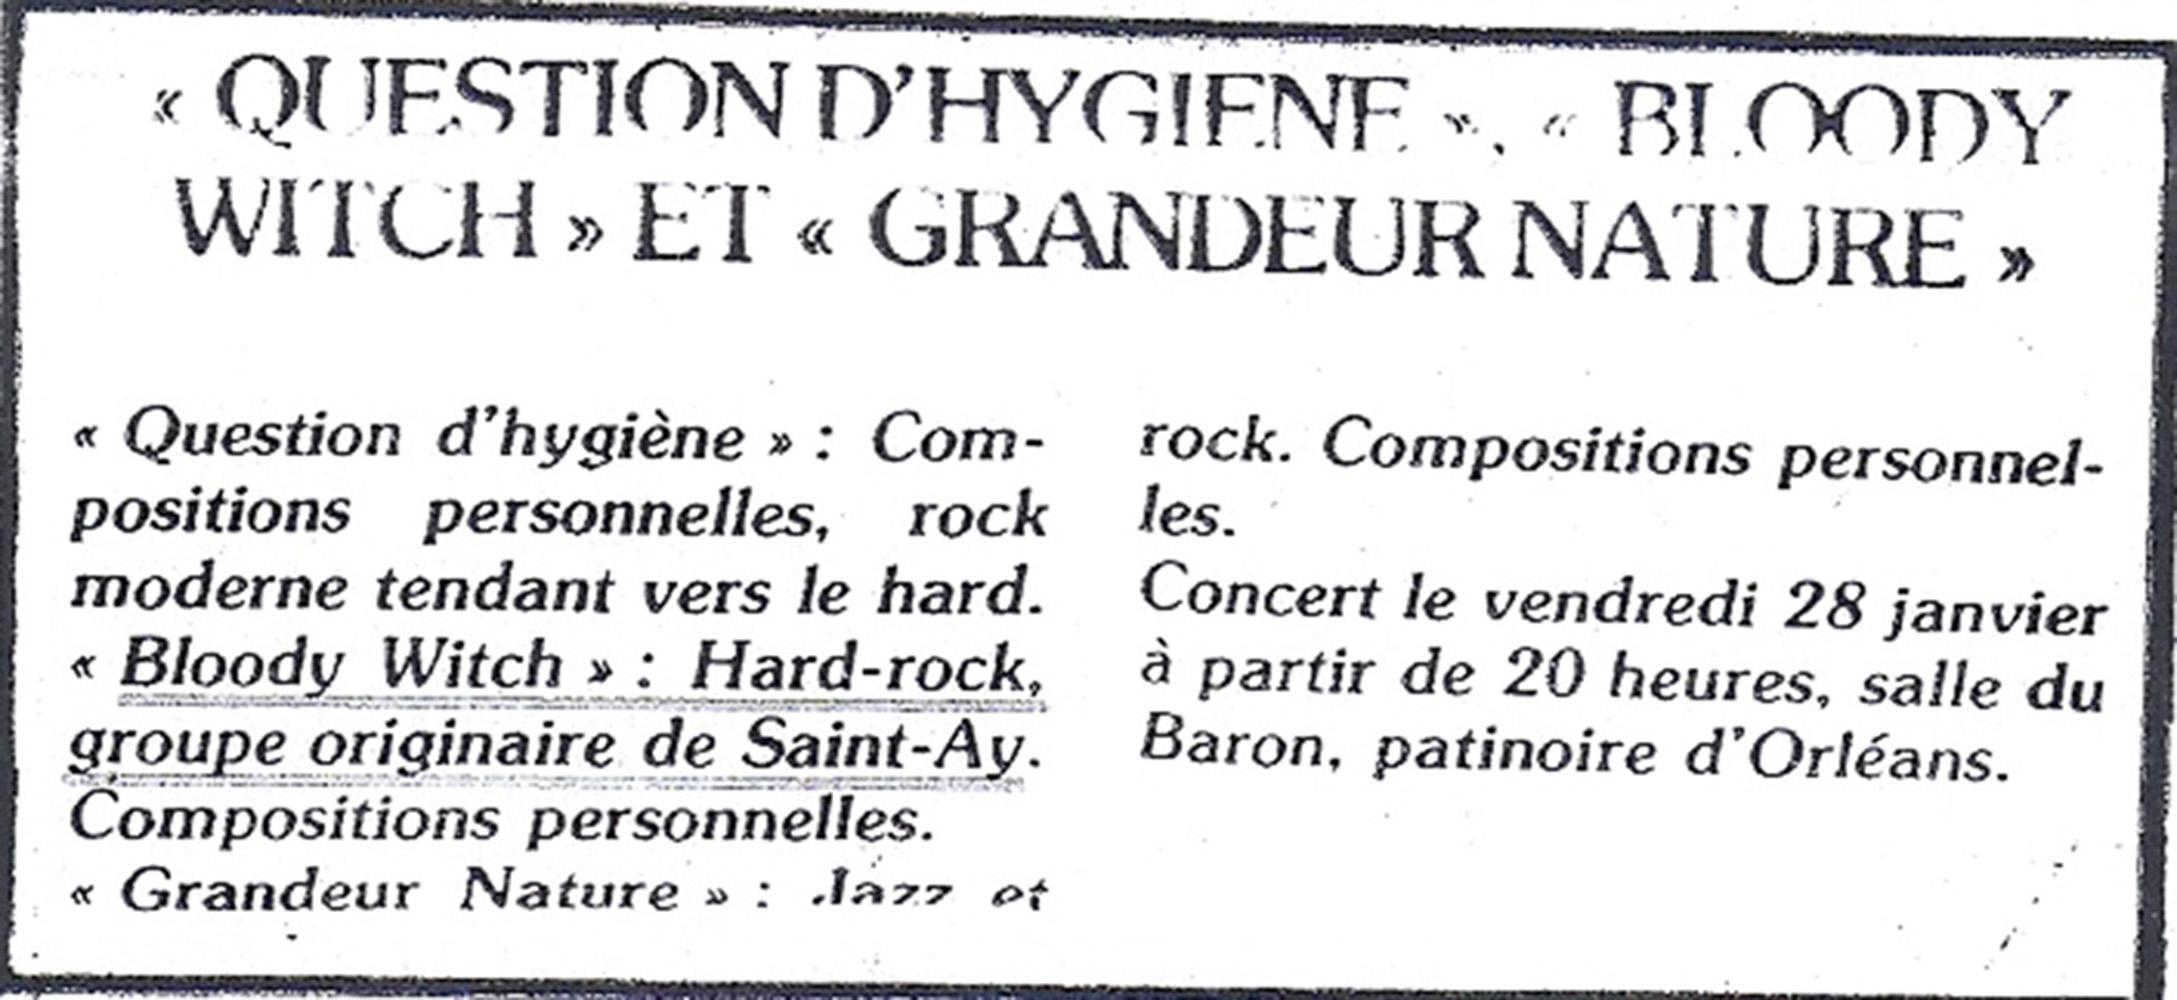 1983_01_28_Presse_002